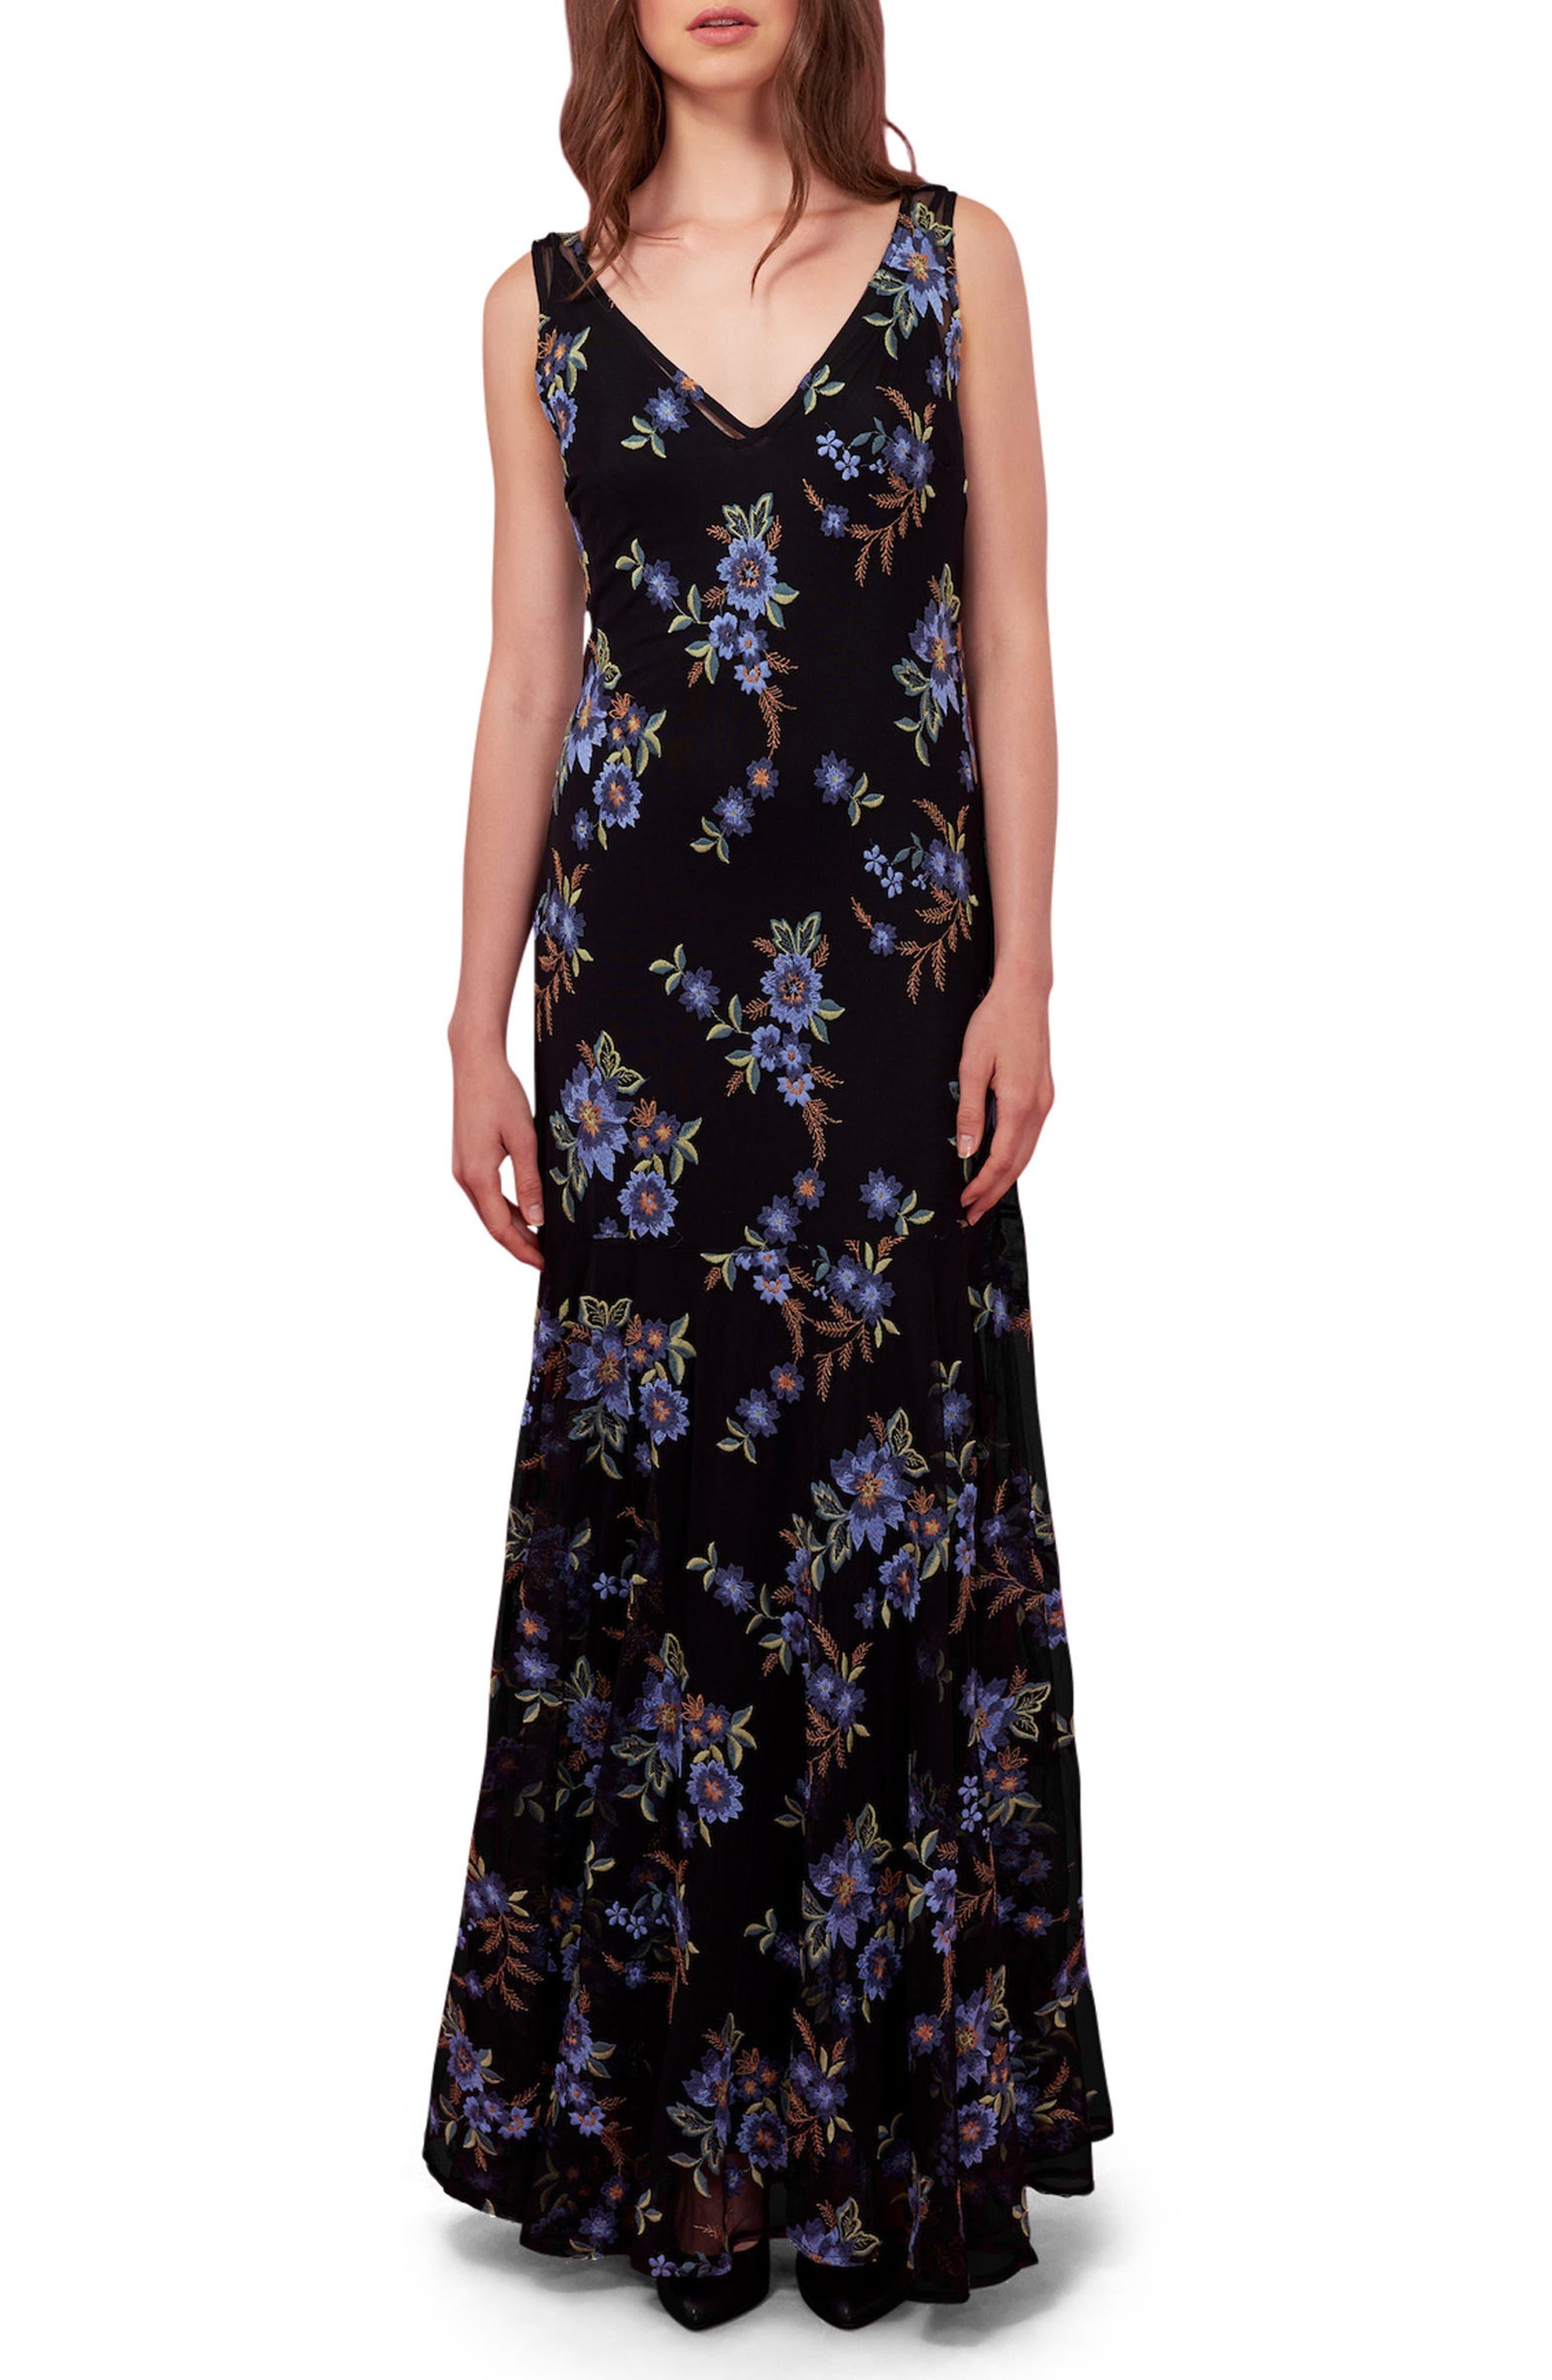 Embroidered Mesh Maxi Dress,                             Main thumbnail 1, color,                             Black/ Multi